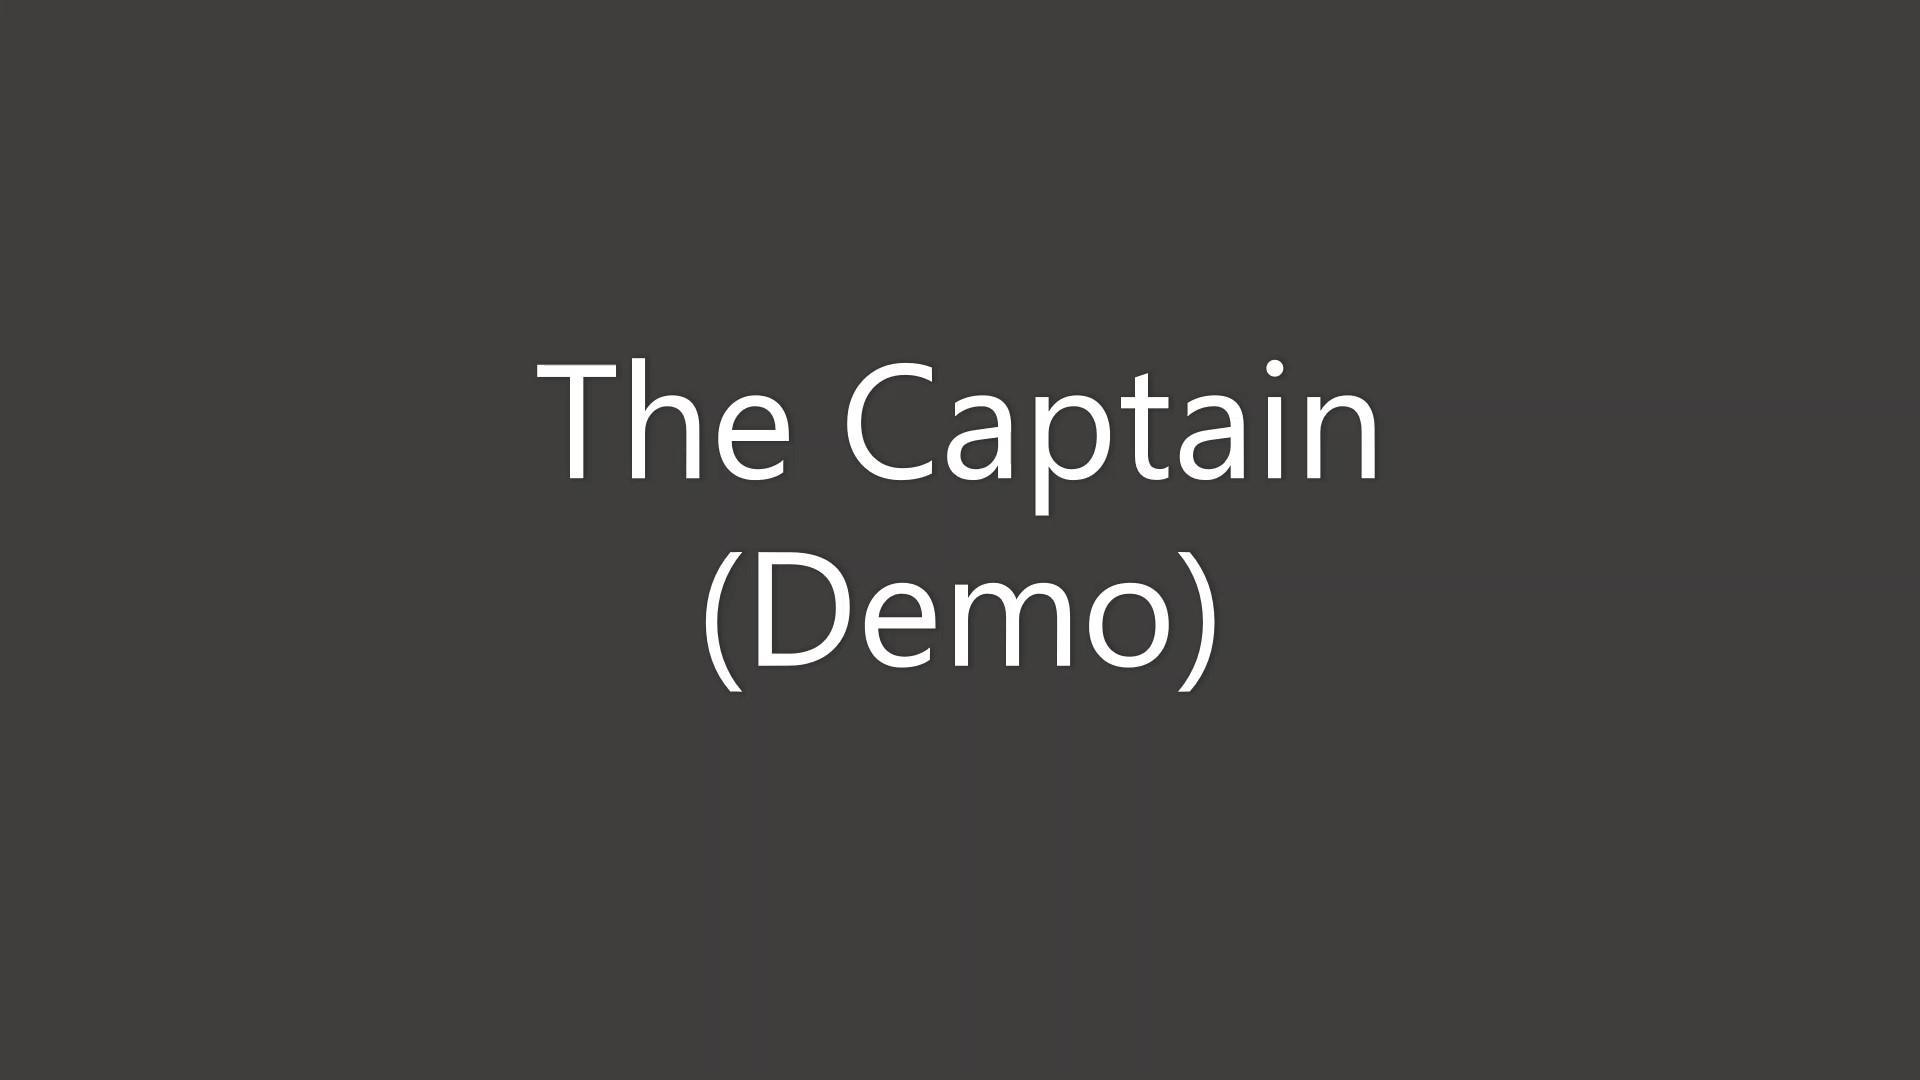 The Captain Demo